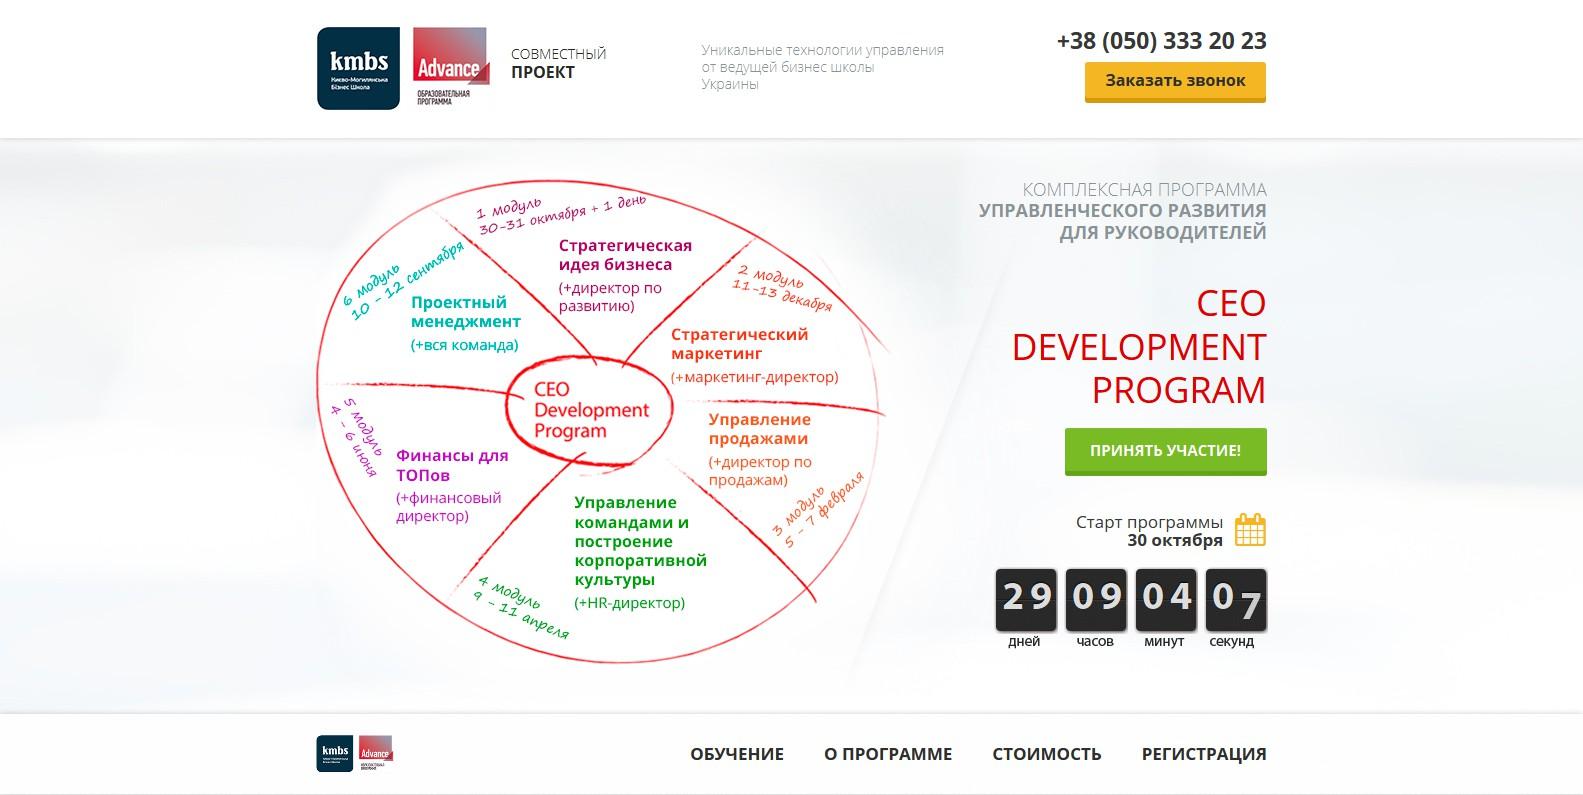 CEO Development Program (kmbs)